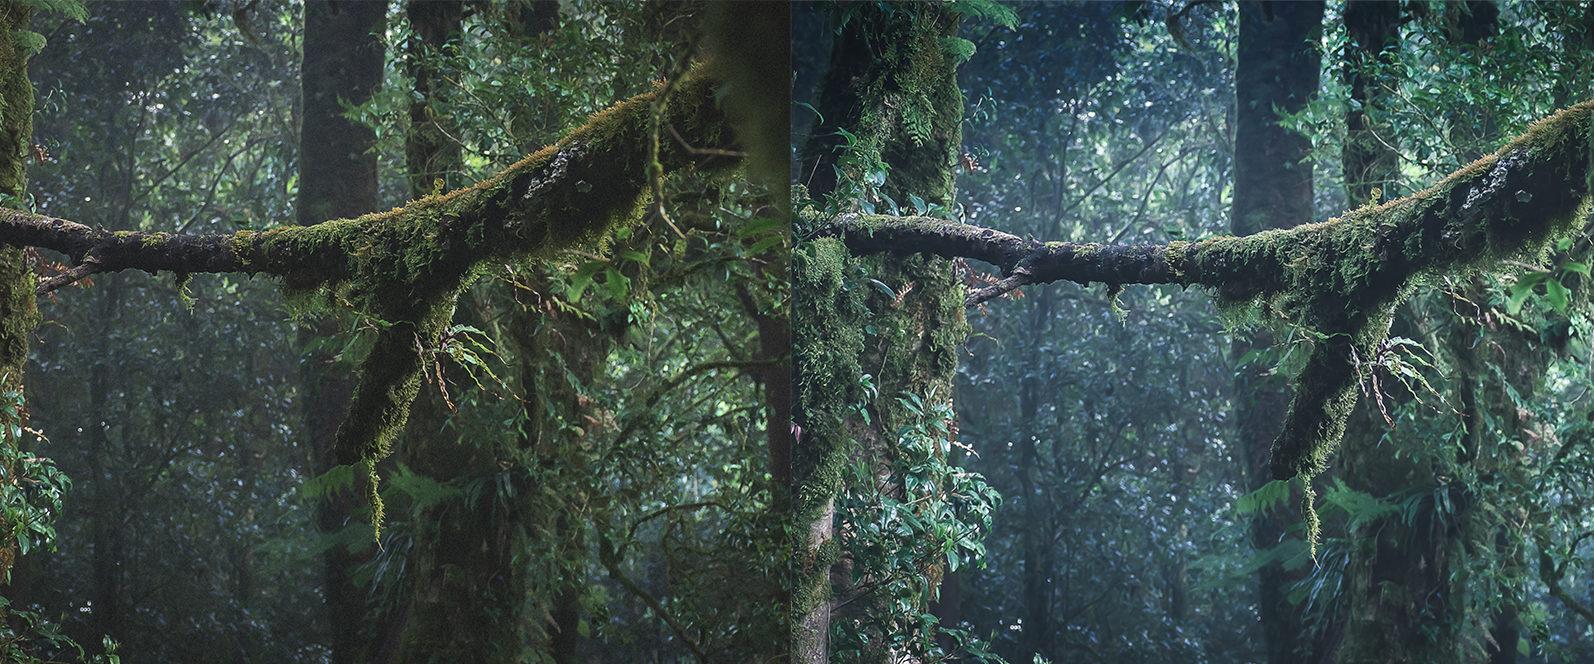 10 x Rain Forest Lightroom Presets | Green Lightroom Presets | Nature Presets - Rain Forest Preview 10 -